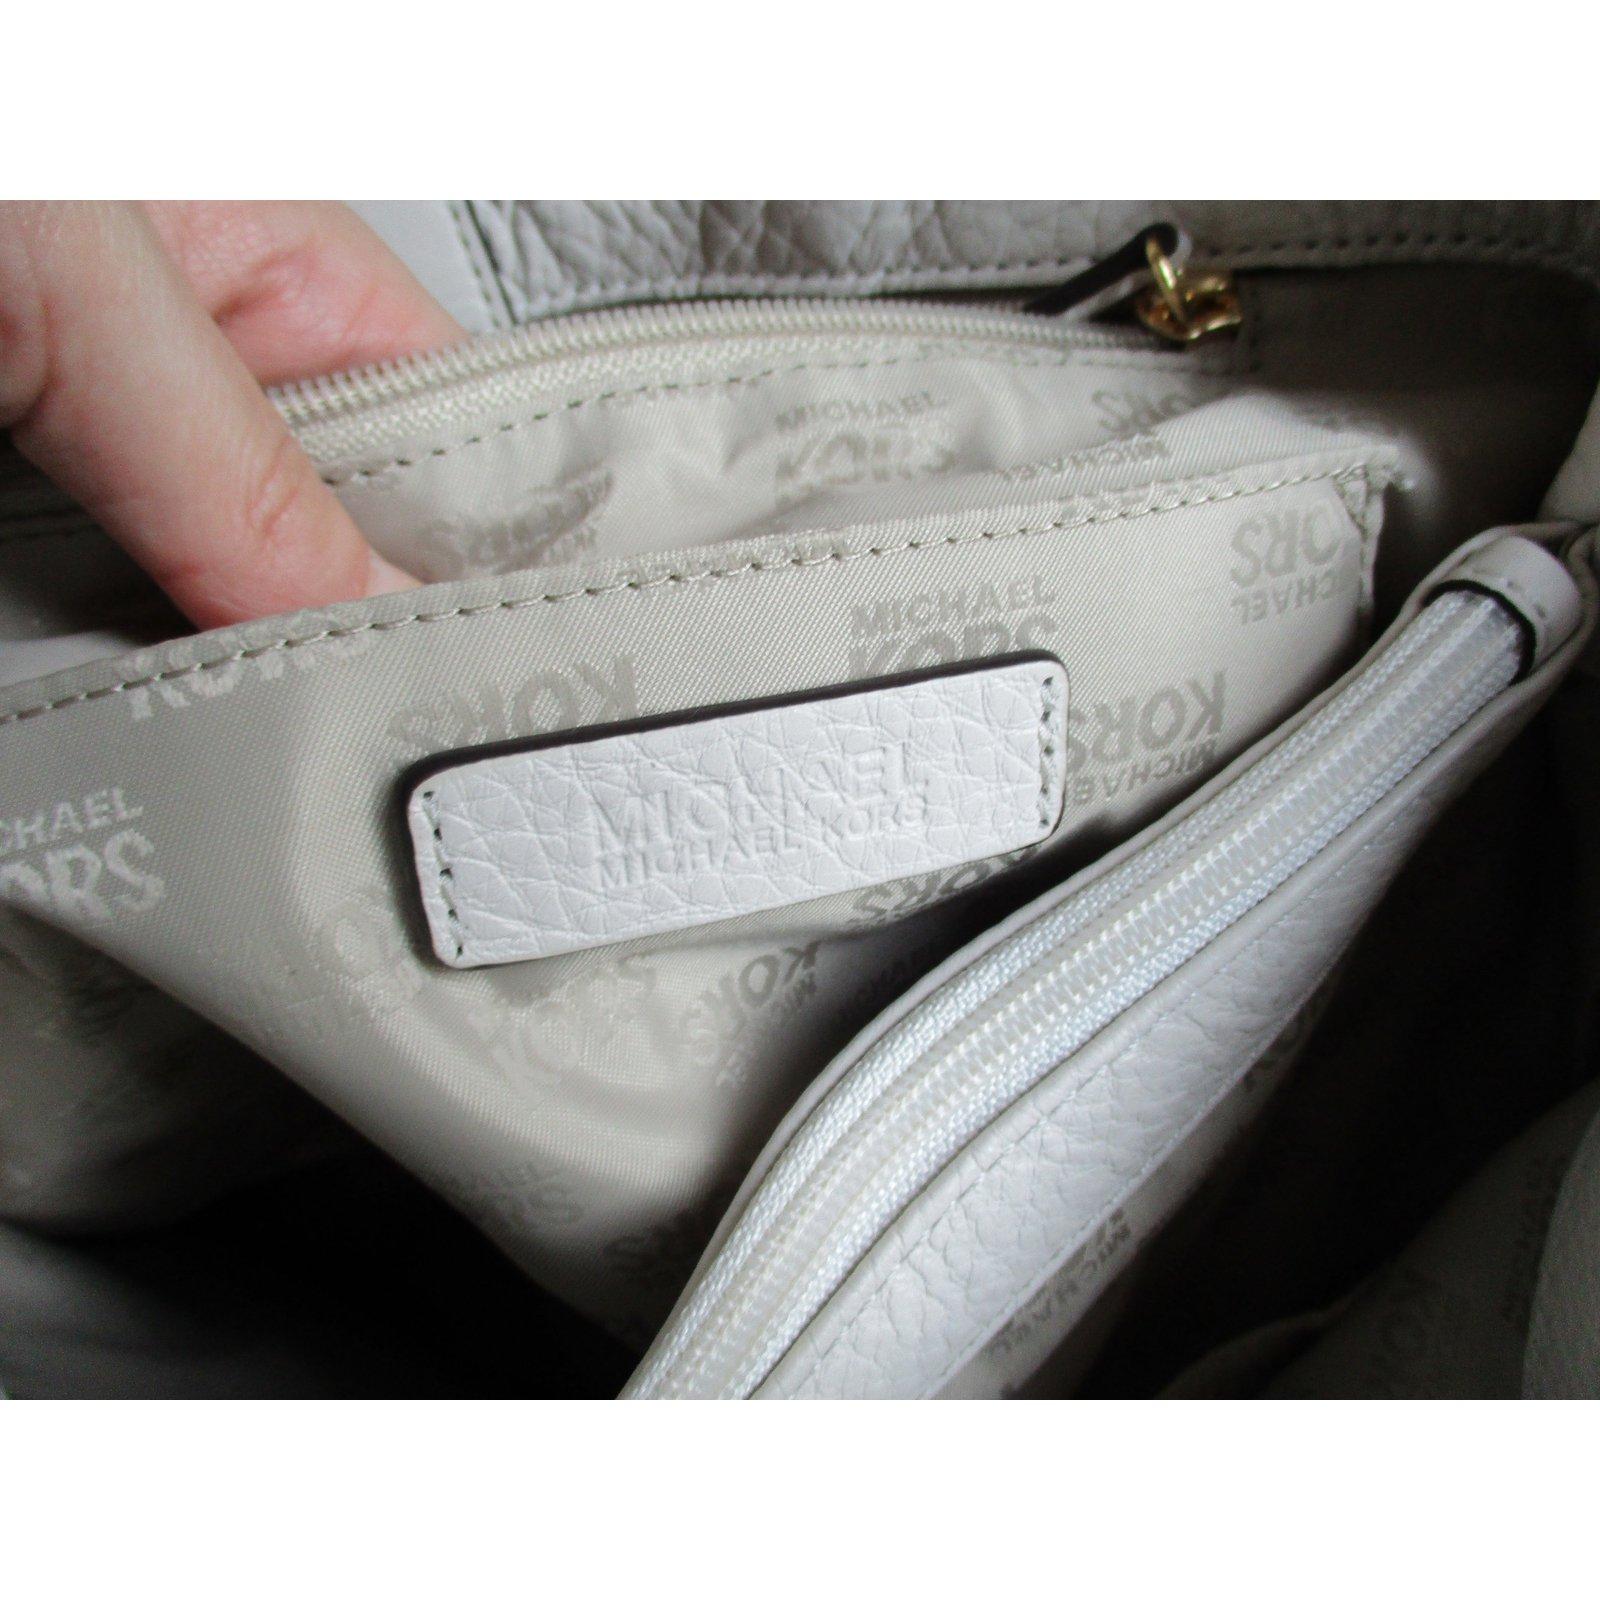 Facebook · Pin This. Michael Kors Fulton Chain Tote Vanilla Color Leather  Handbags Leather Beige ... c113c911c446e